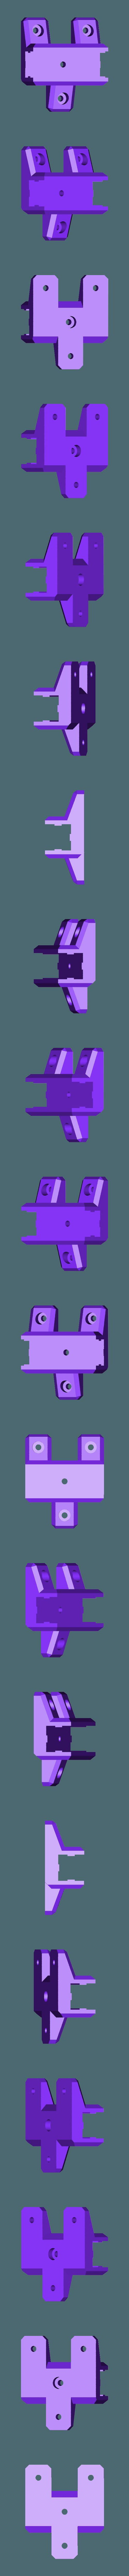 2020-Table-Bracket-B.stl Download free STL file 2020 Profile Aluminum 3D Printable Erector Set • 3D printer model, adamjvr